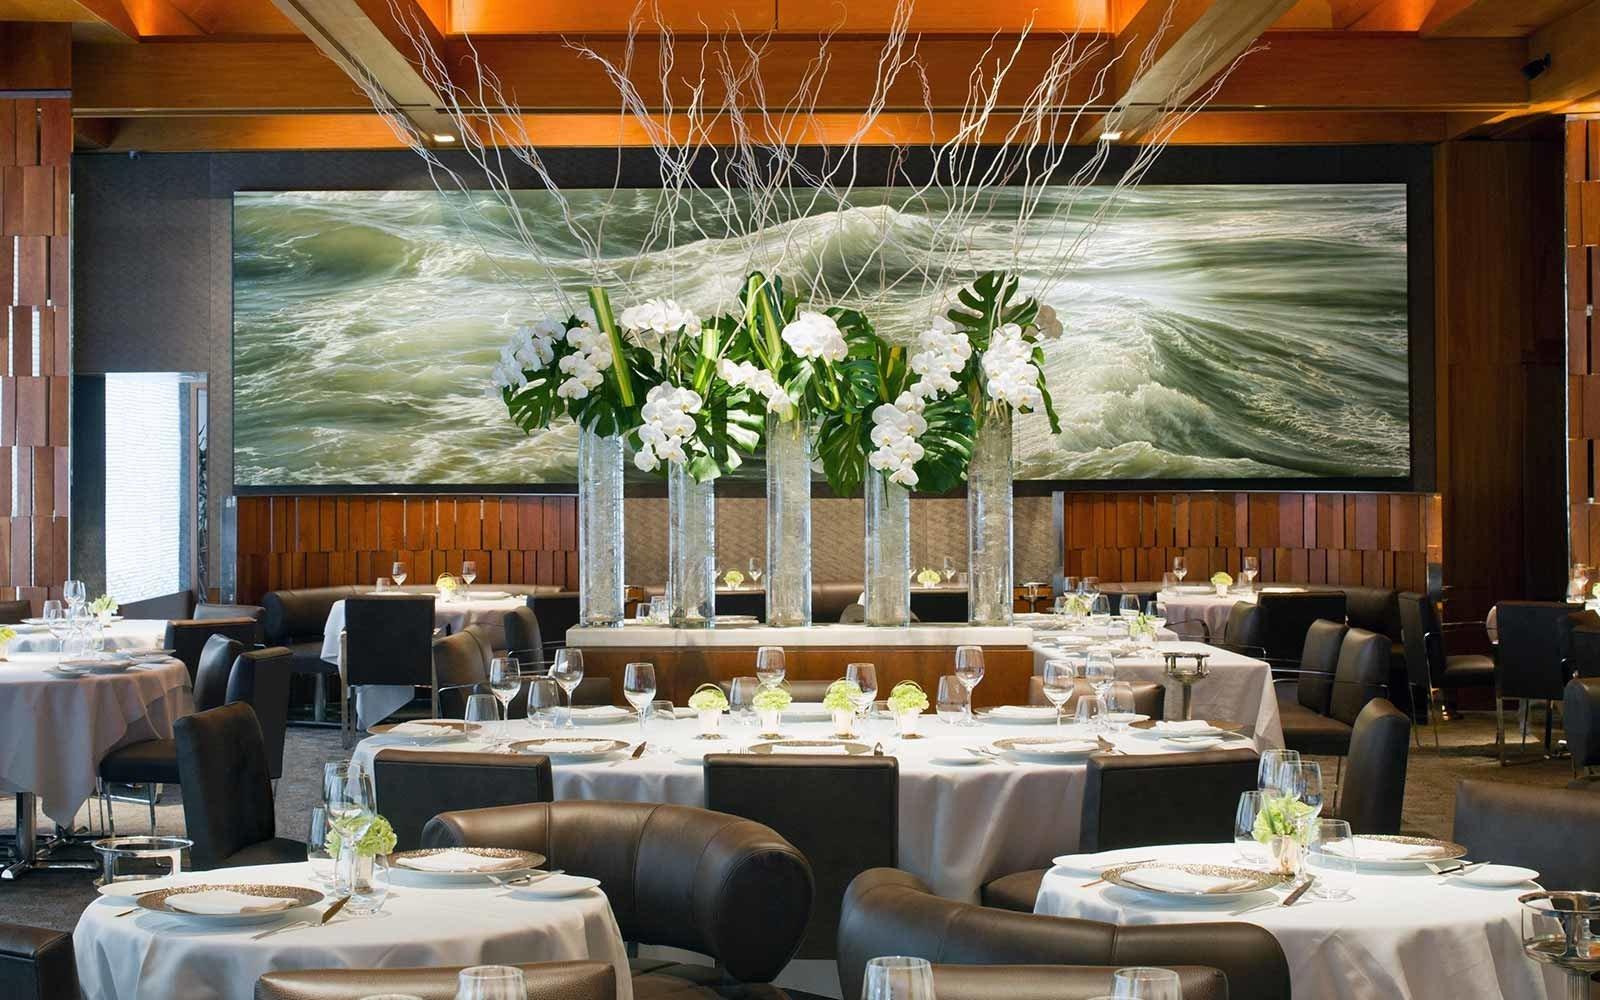 Food + Drink table indoor function hall window restaurant banquet conference hall tableware interior design Dining ballroom ceremony